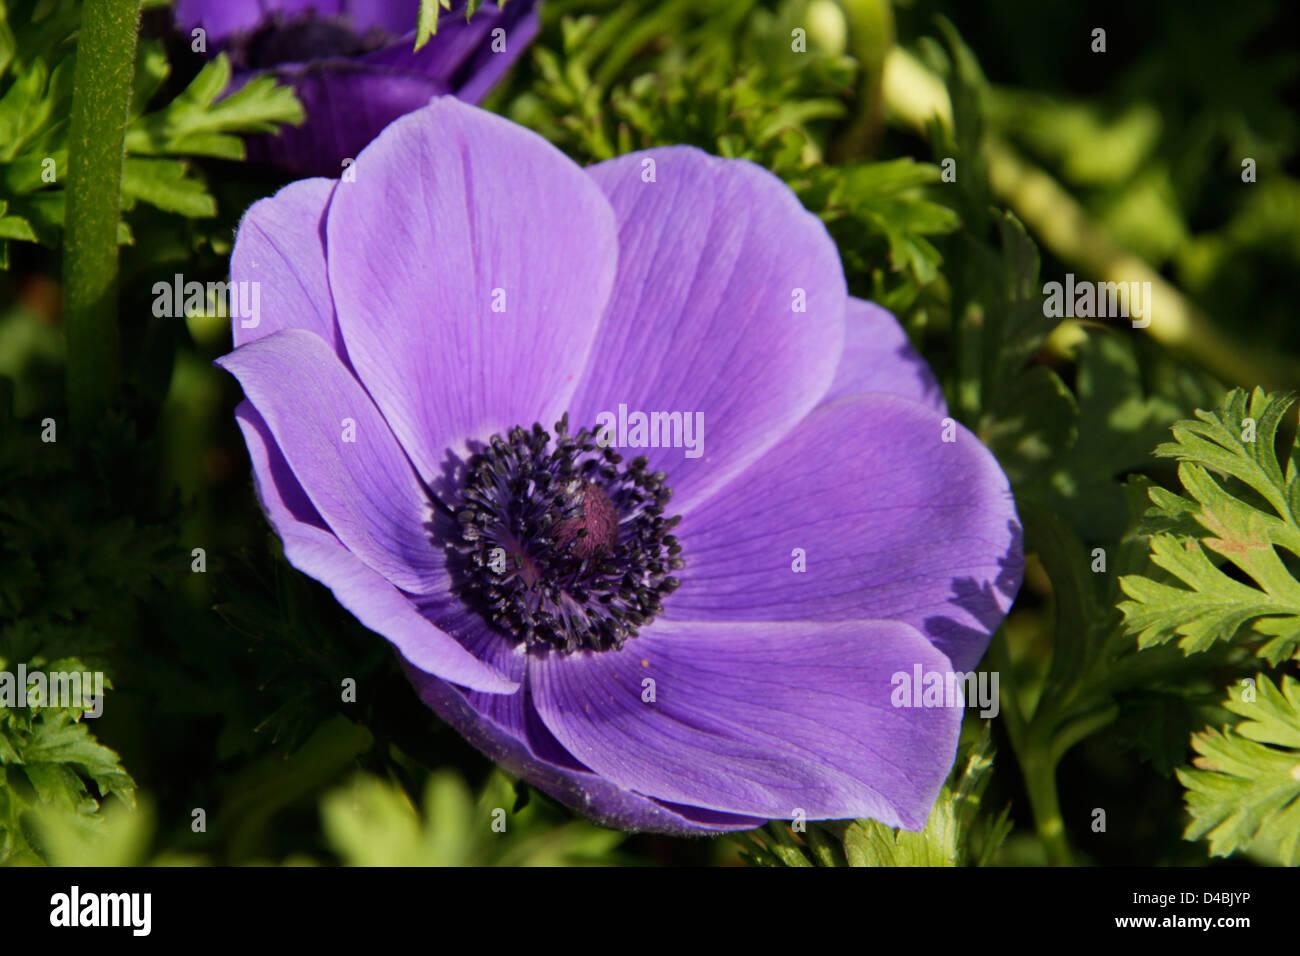 Uncultivated Blue Poppy Flower On Sunlight Spring Field Stock Photo